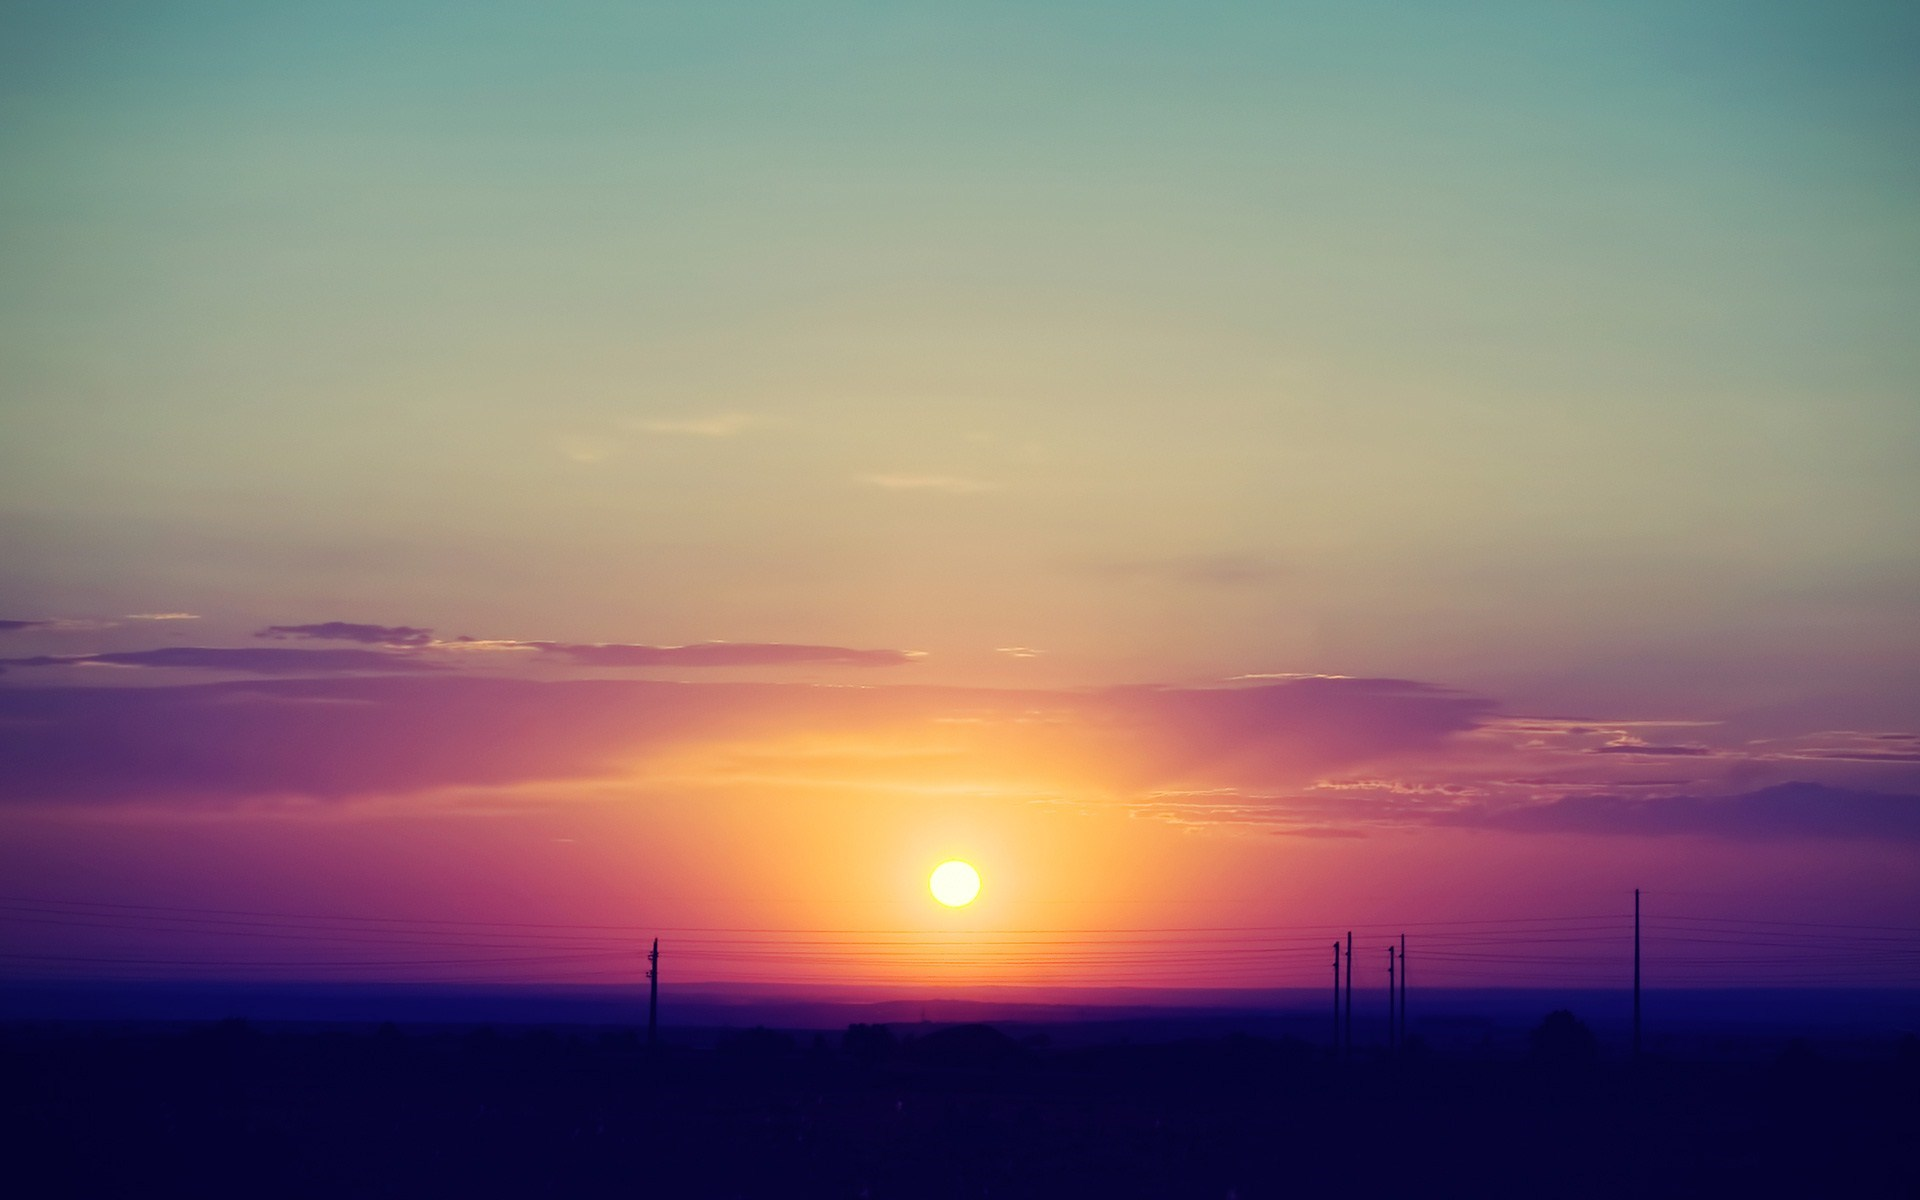 Sunset Sky Clouds Landscape Photo #7025703